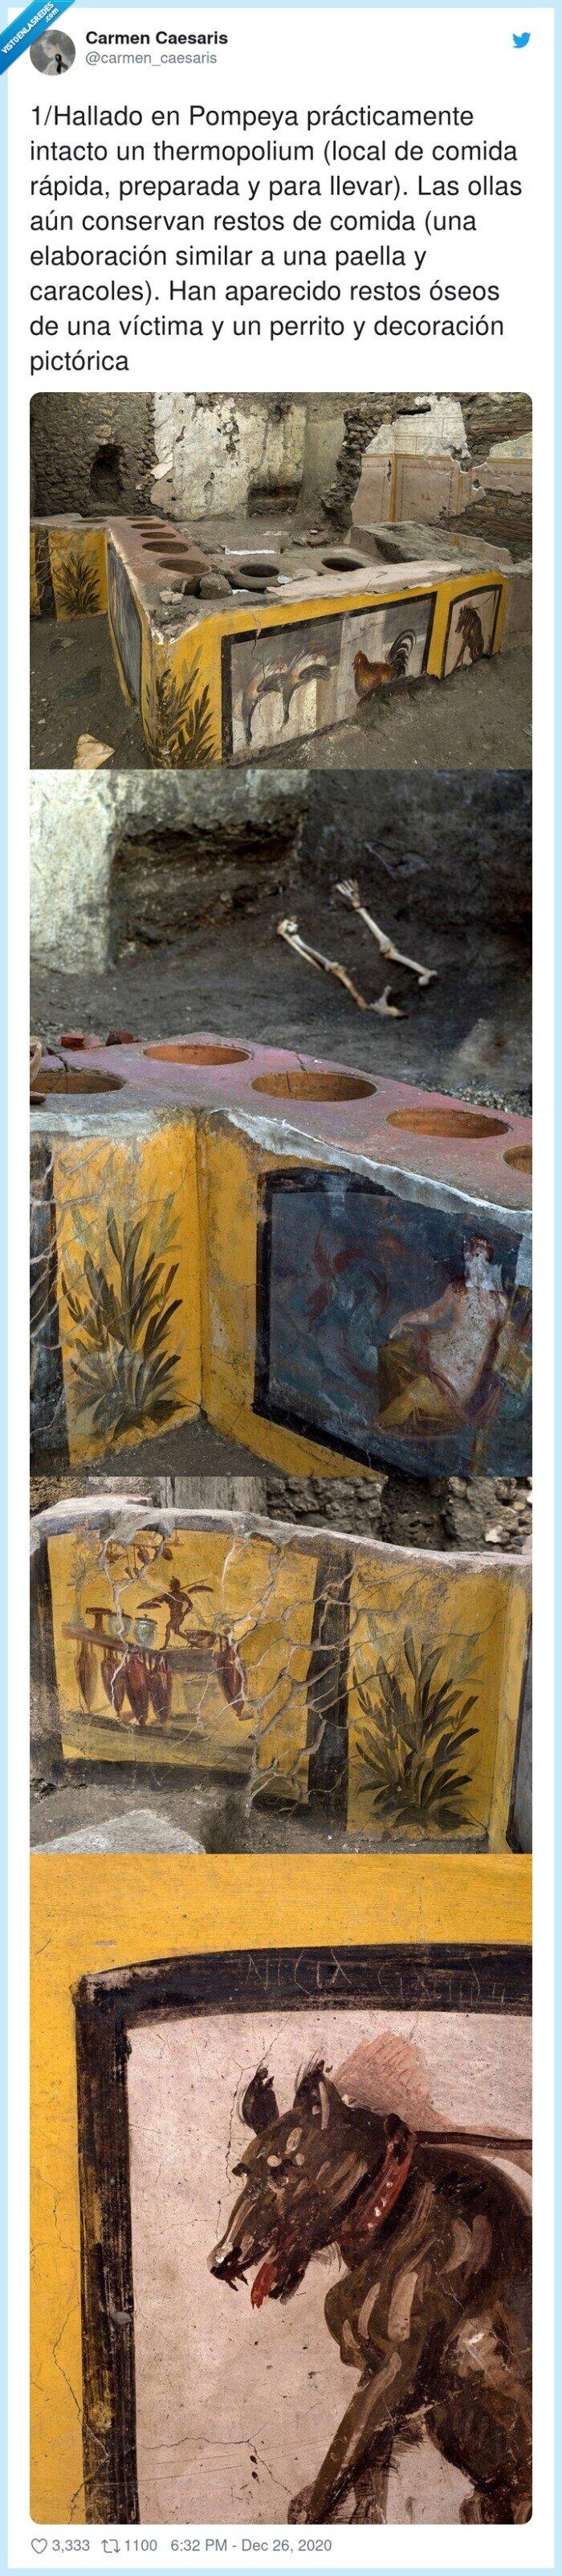 decoración,elaboración,pictórica,pompeya,thermopolium